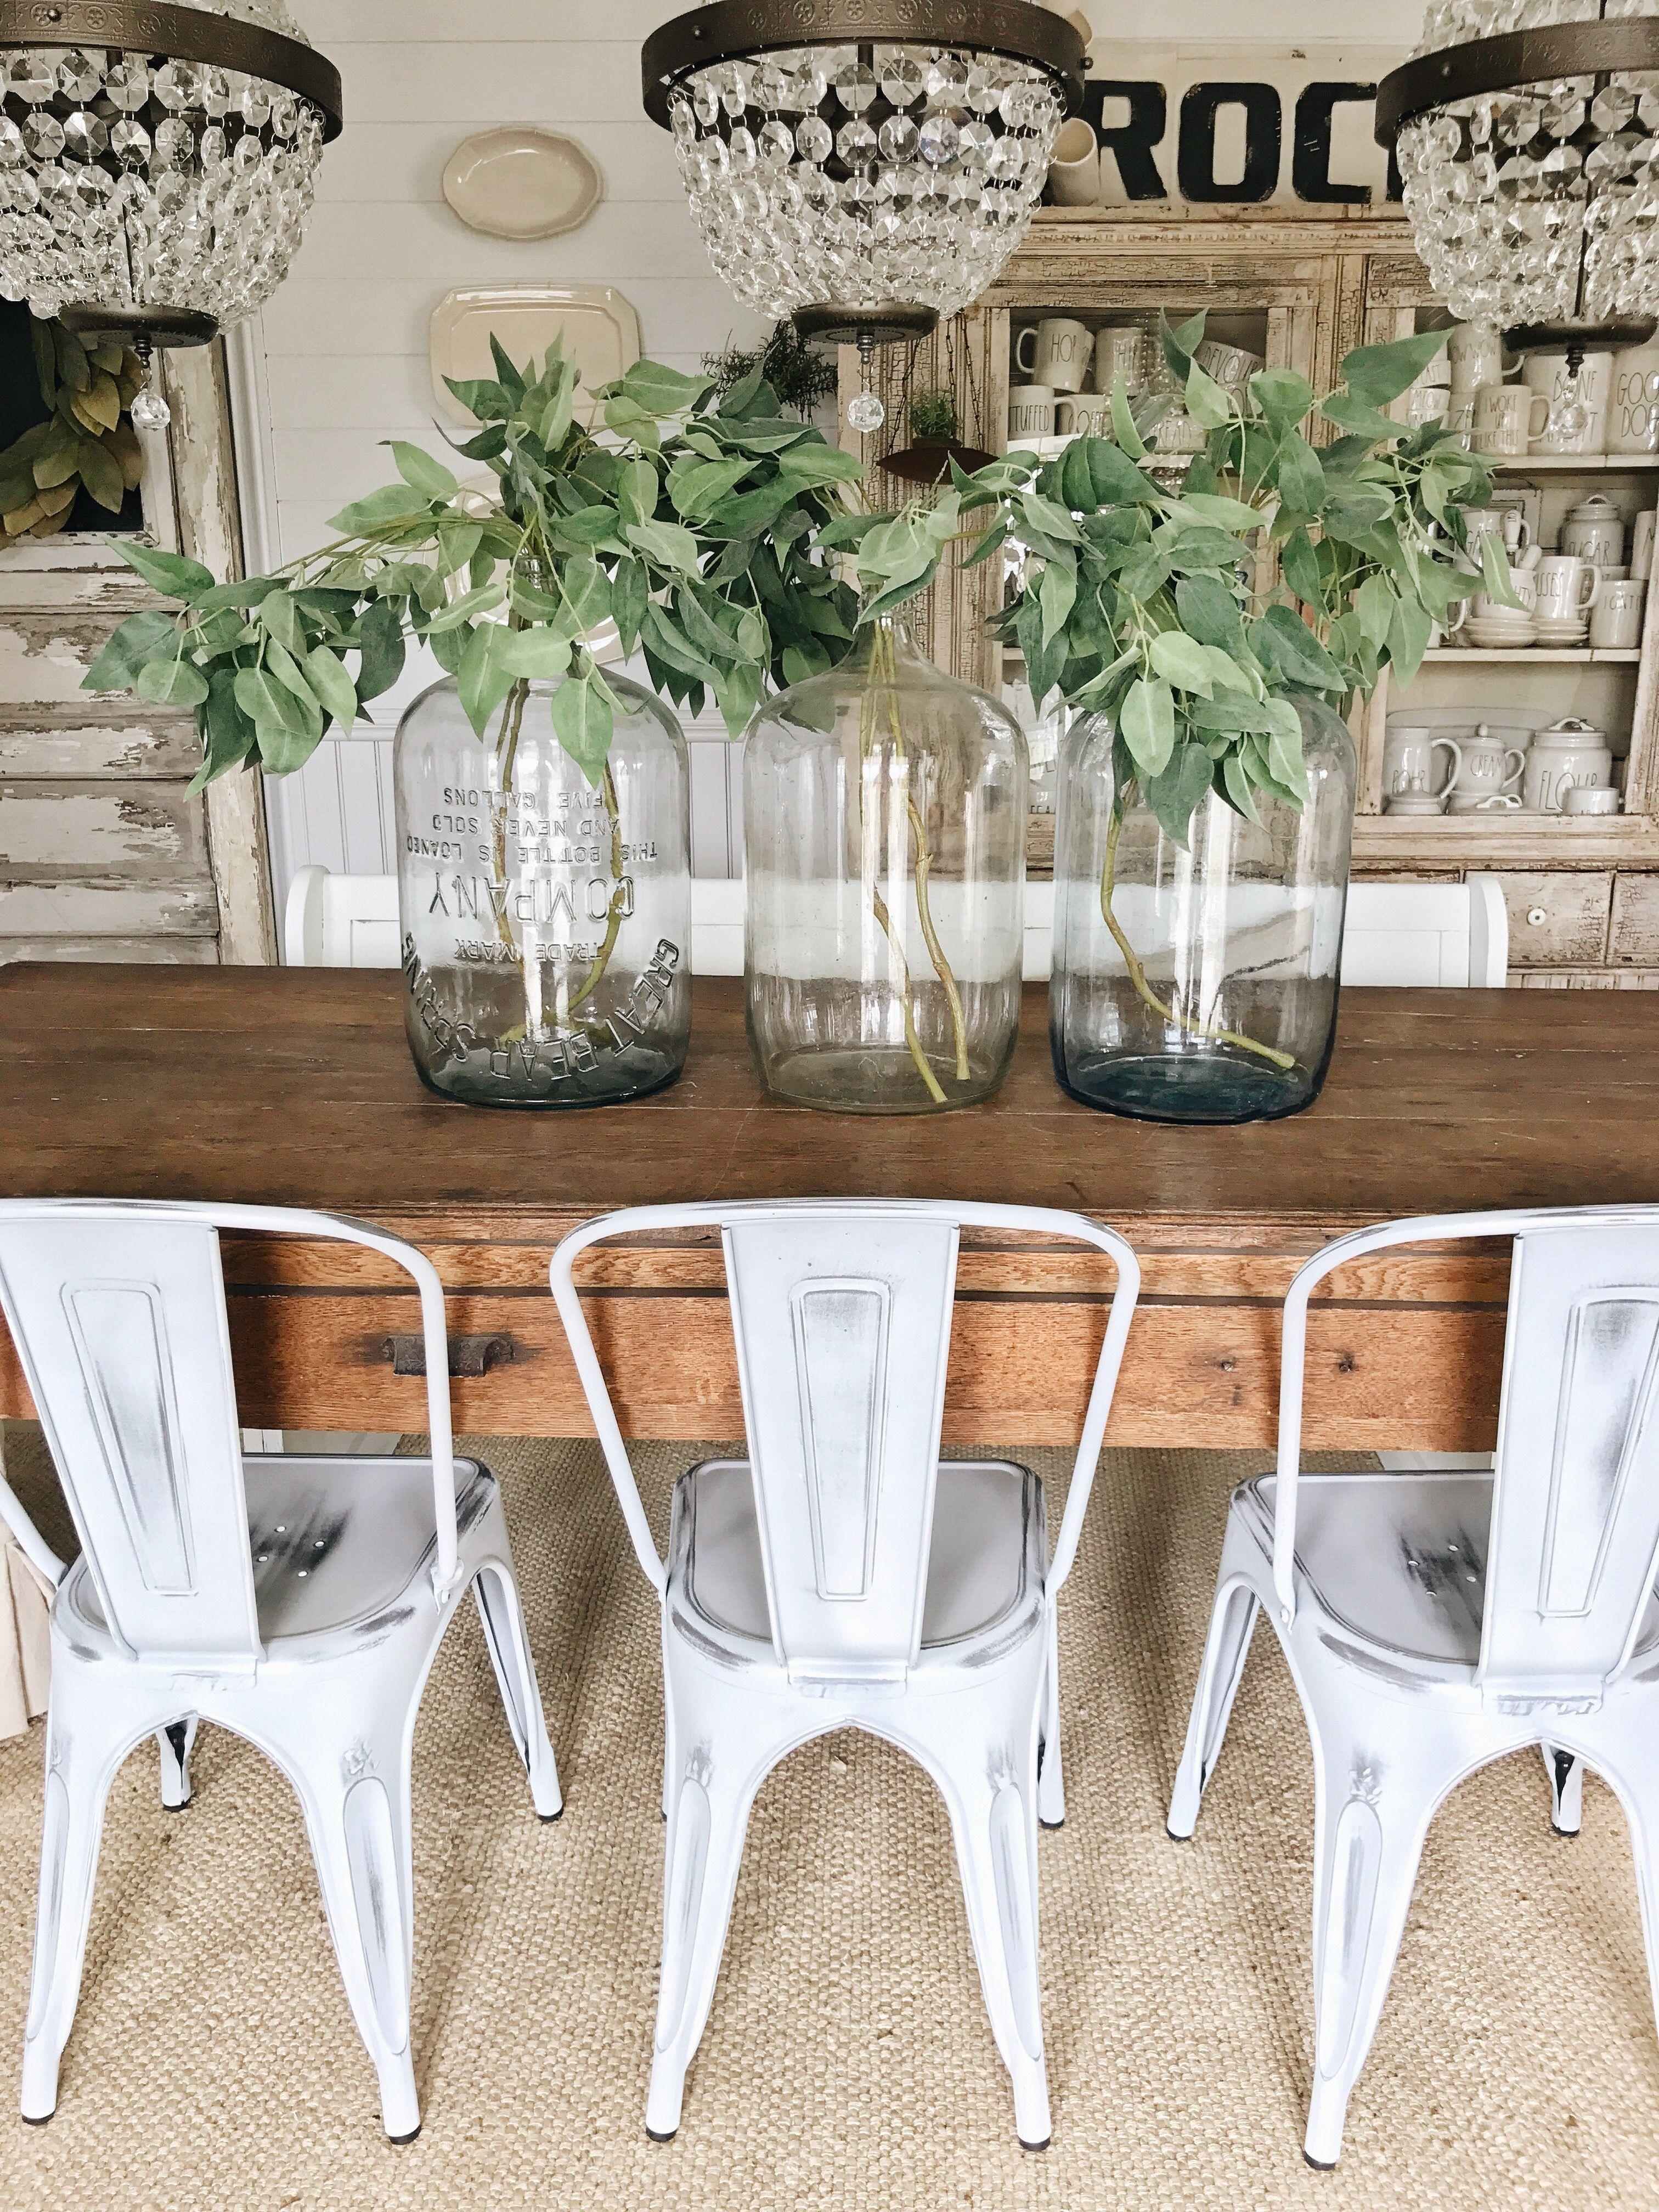 Simple Glass Jug Branch Spring Centerpiece Dining Room Table Centerpieces Jug Decor Glass Jugs Decor